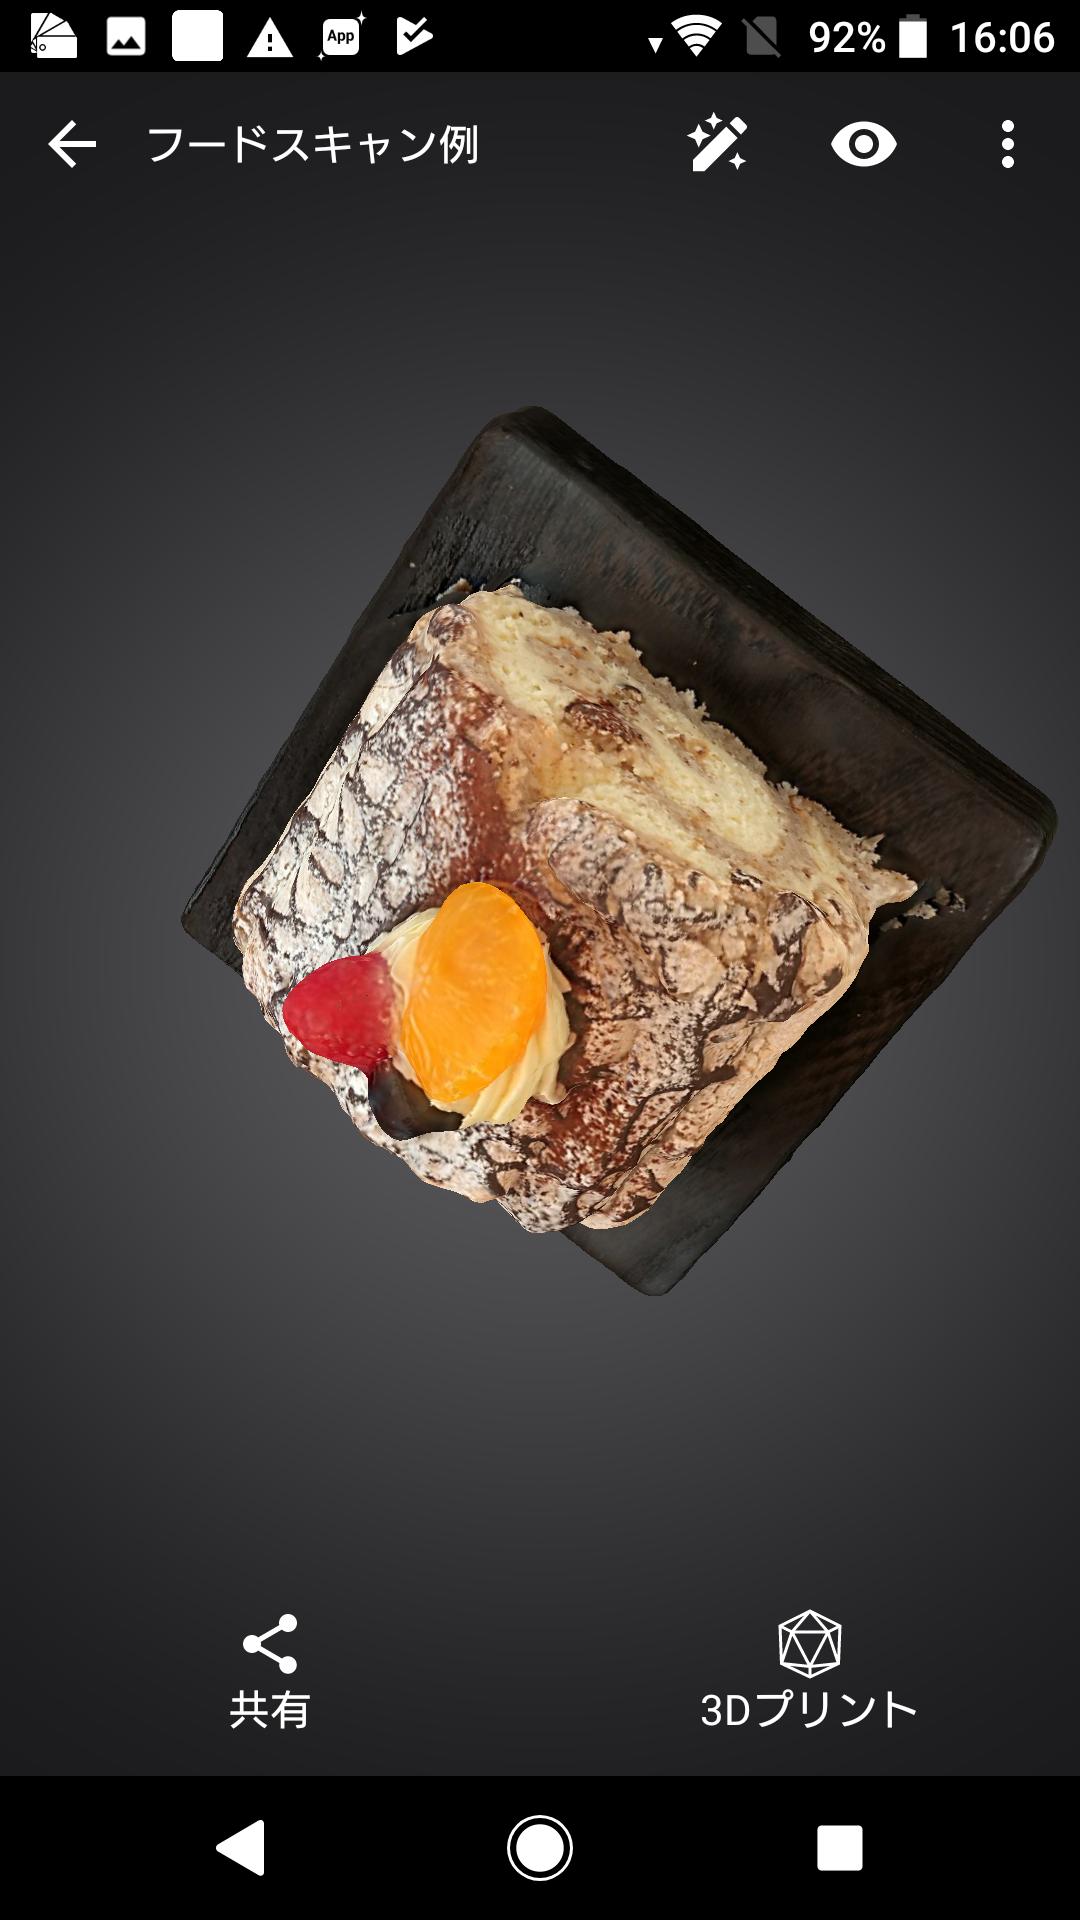 Sony Xperia XZ1 3Dクリエーター 3Dプリント 自由造形スキャン ケーキ3